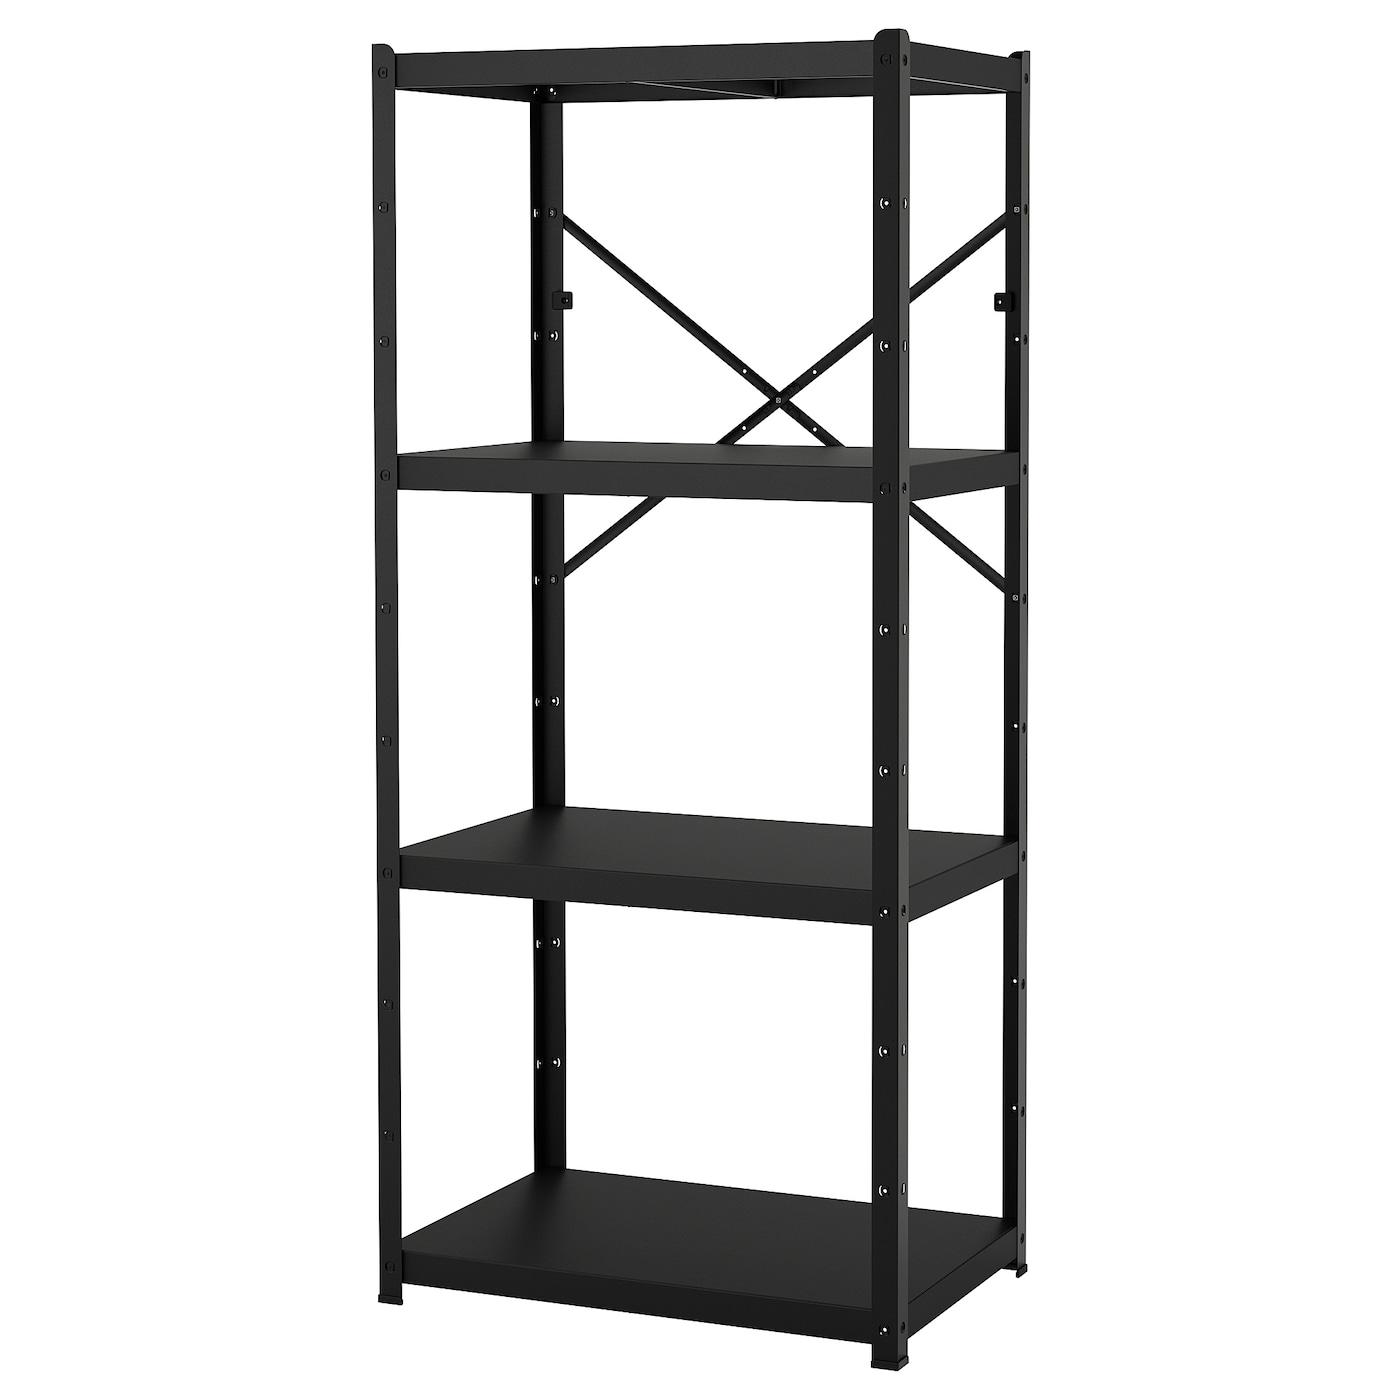 Metalen Opbergrek Zwart.Opbergsystemen Rekken Vakkenkasten Ikea